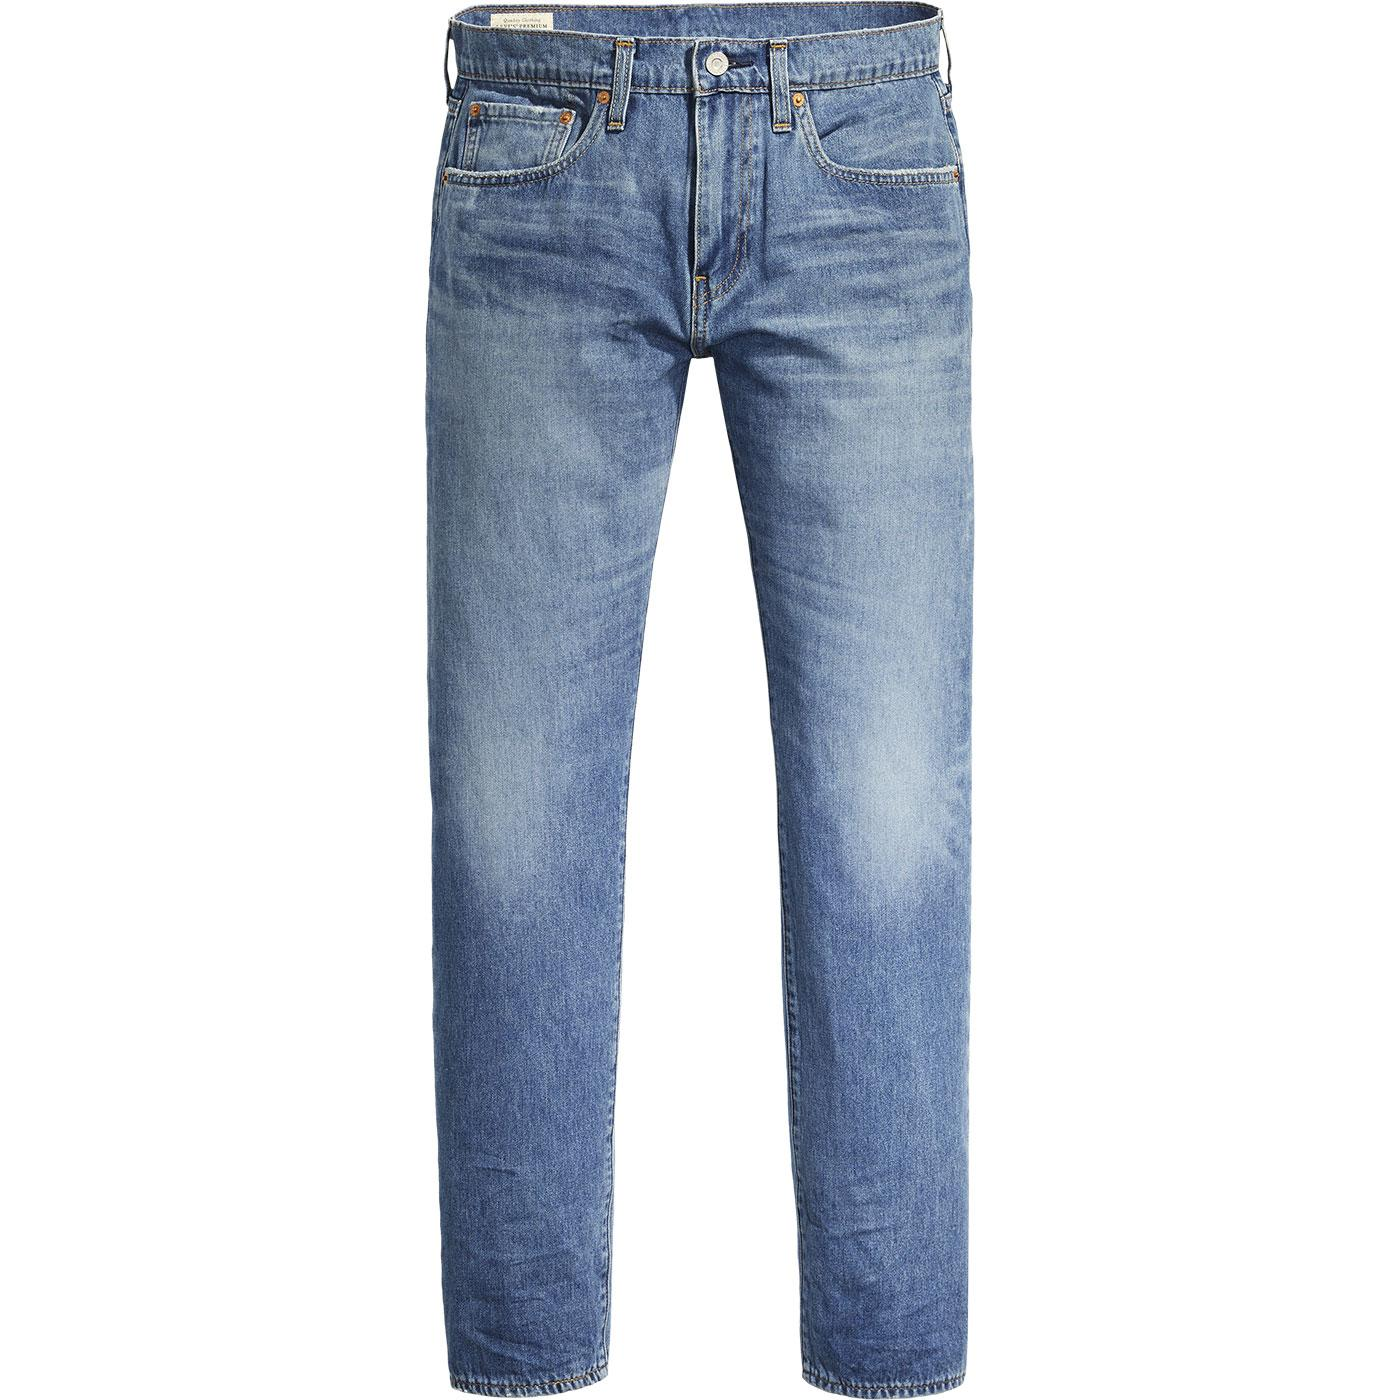 LEVI'S 502 Taper Fit Stretch Jeans (Ocala Park)